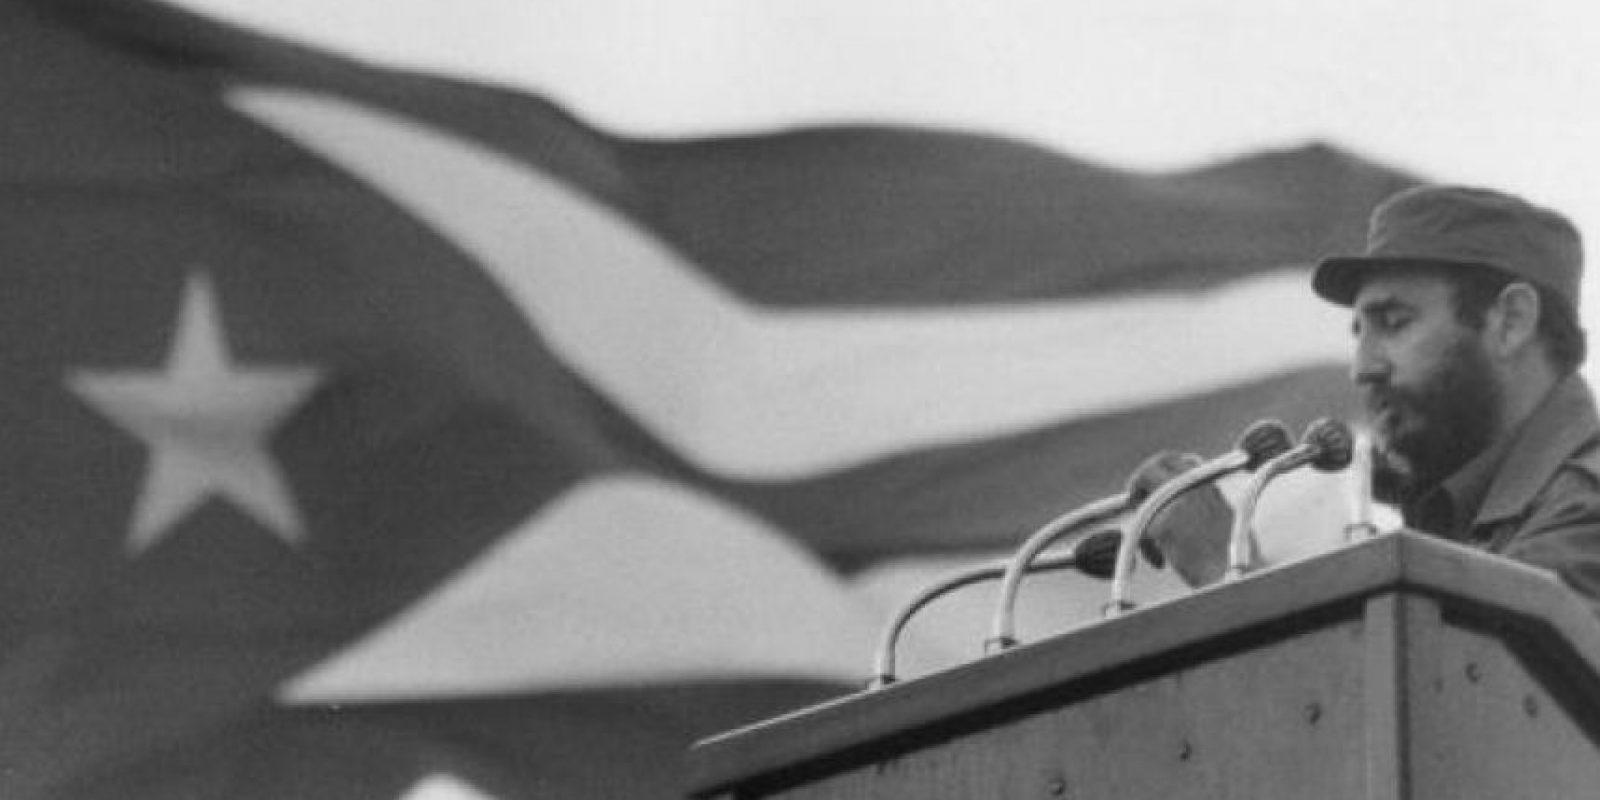 Sobrevivió a 638 intentos de asesinato de 1959 a 2006 Foto:Getty Images